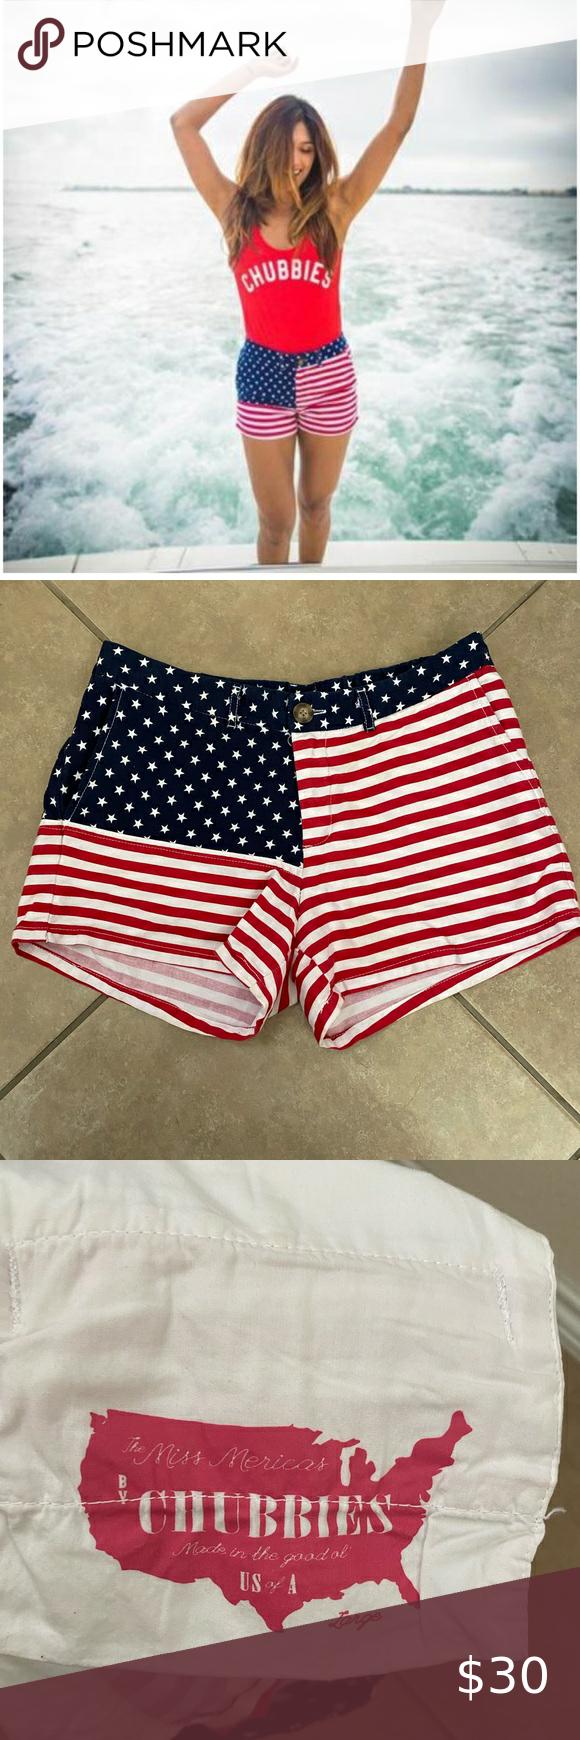 Meripex Apparel Men S American Flag Swim Trunks The Lone Stars Cheaper Than Chubbies Review Swim Trunks Mens Outfits Trunks